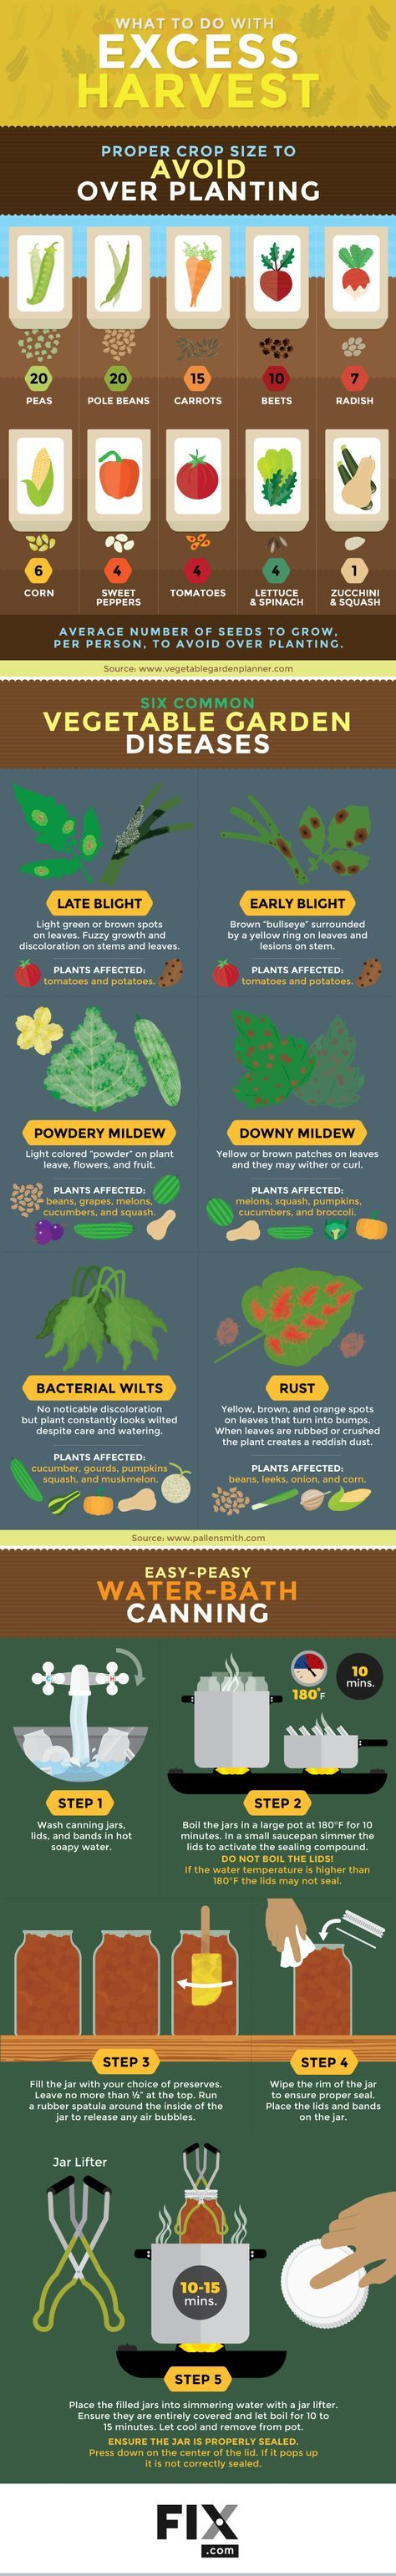 best garden images on pinterest vegetable garden gardening and